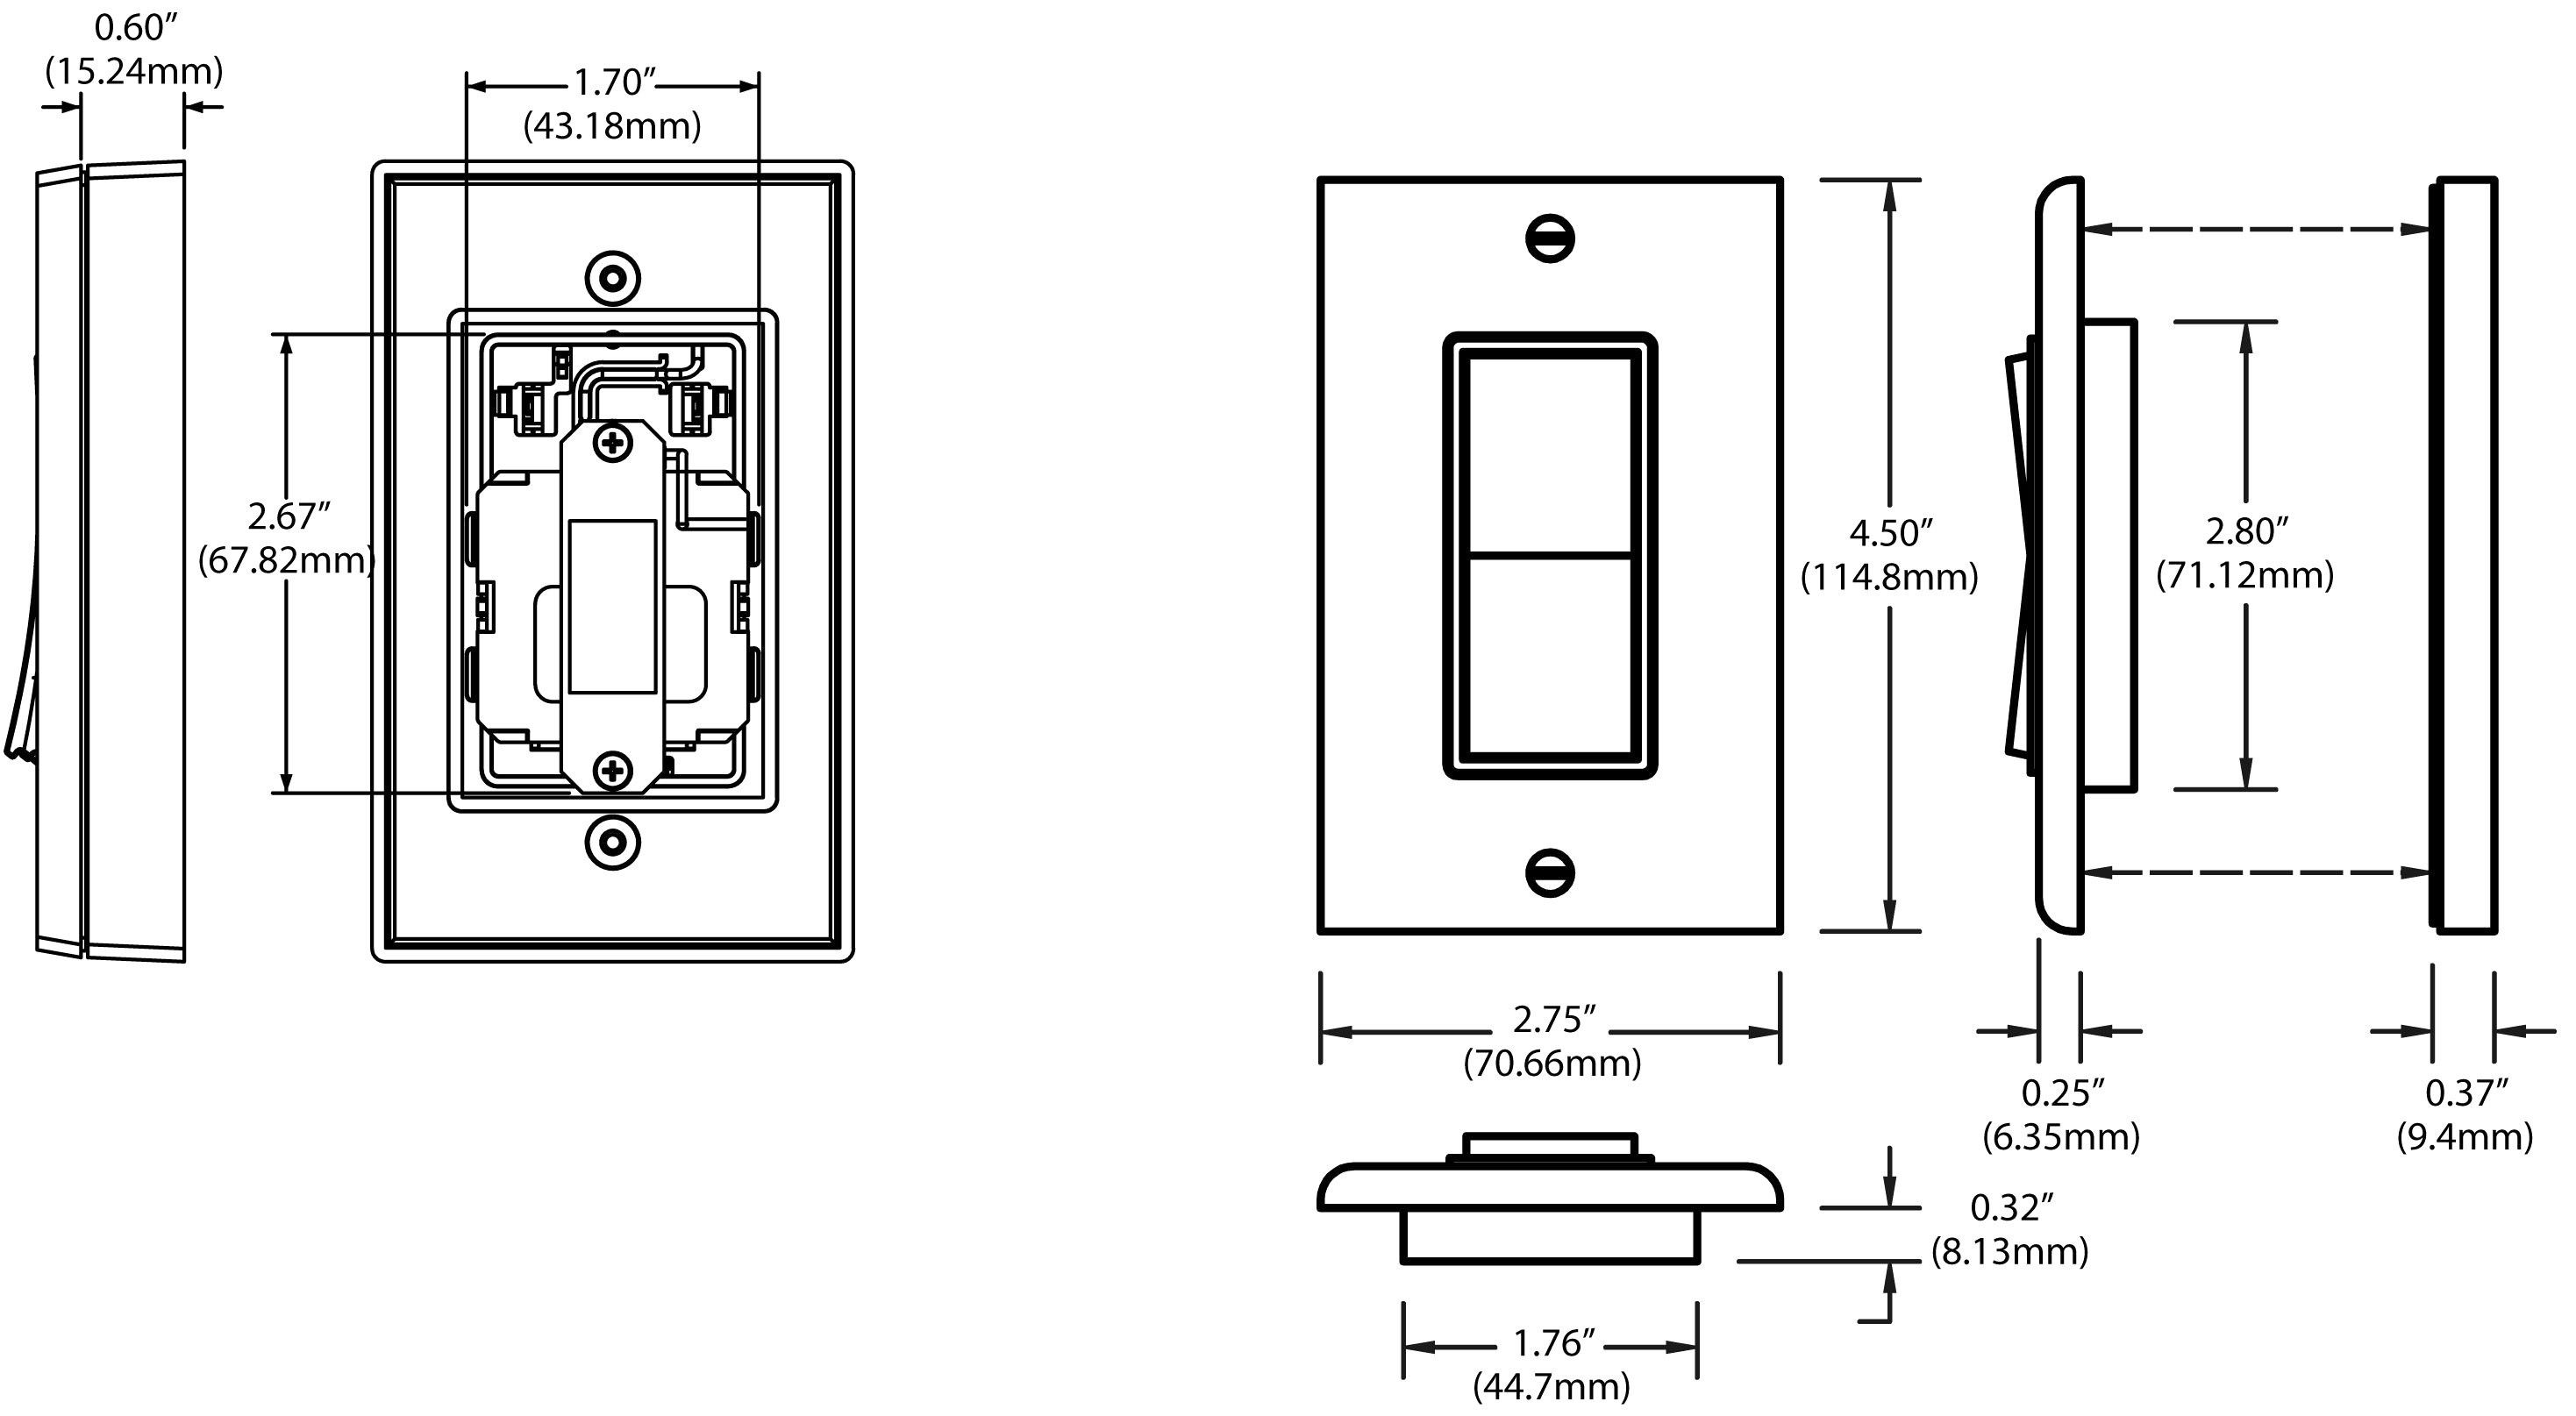 beautiful leviton light switch wiring diagram diagrams digramssample diagramimages wiringdiagramsample wiringdiagram [ 2937 x 1615 Pixel ]